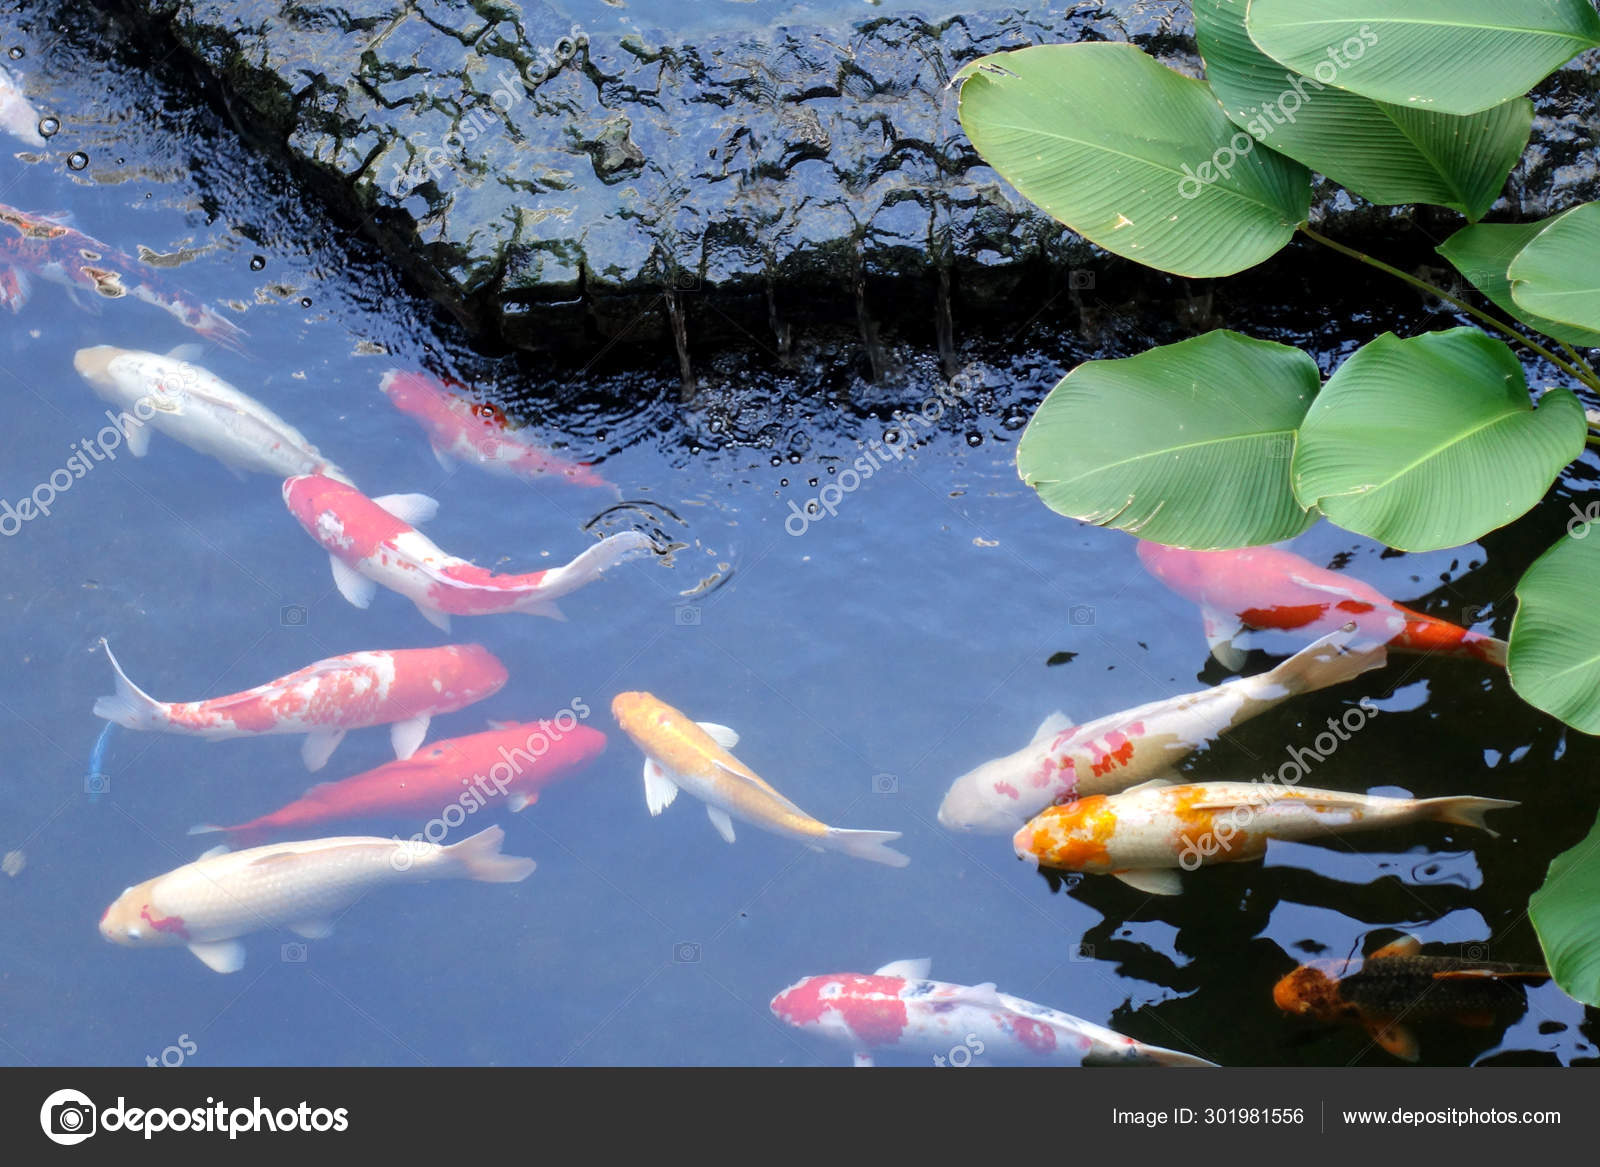 Colorful Japanese Koi Carp Fish Lovely Pond Selective Focus Stock Photo C Tristantan71 301981556